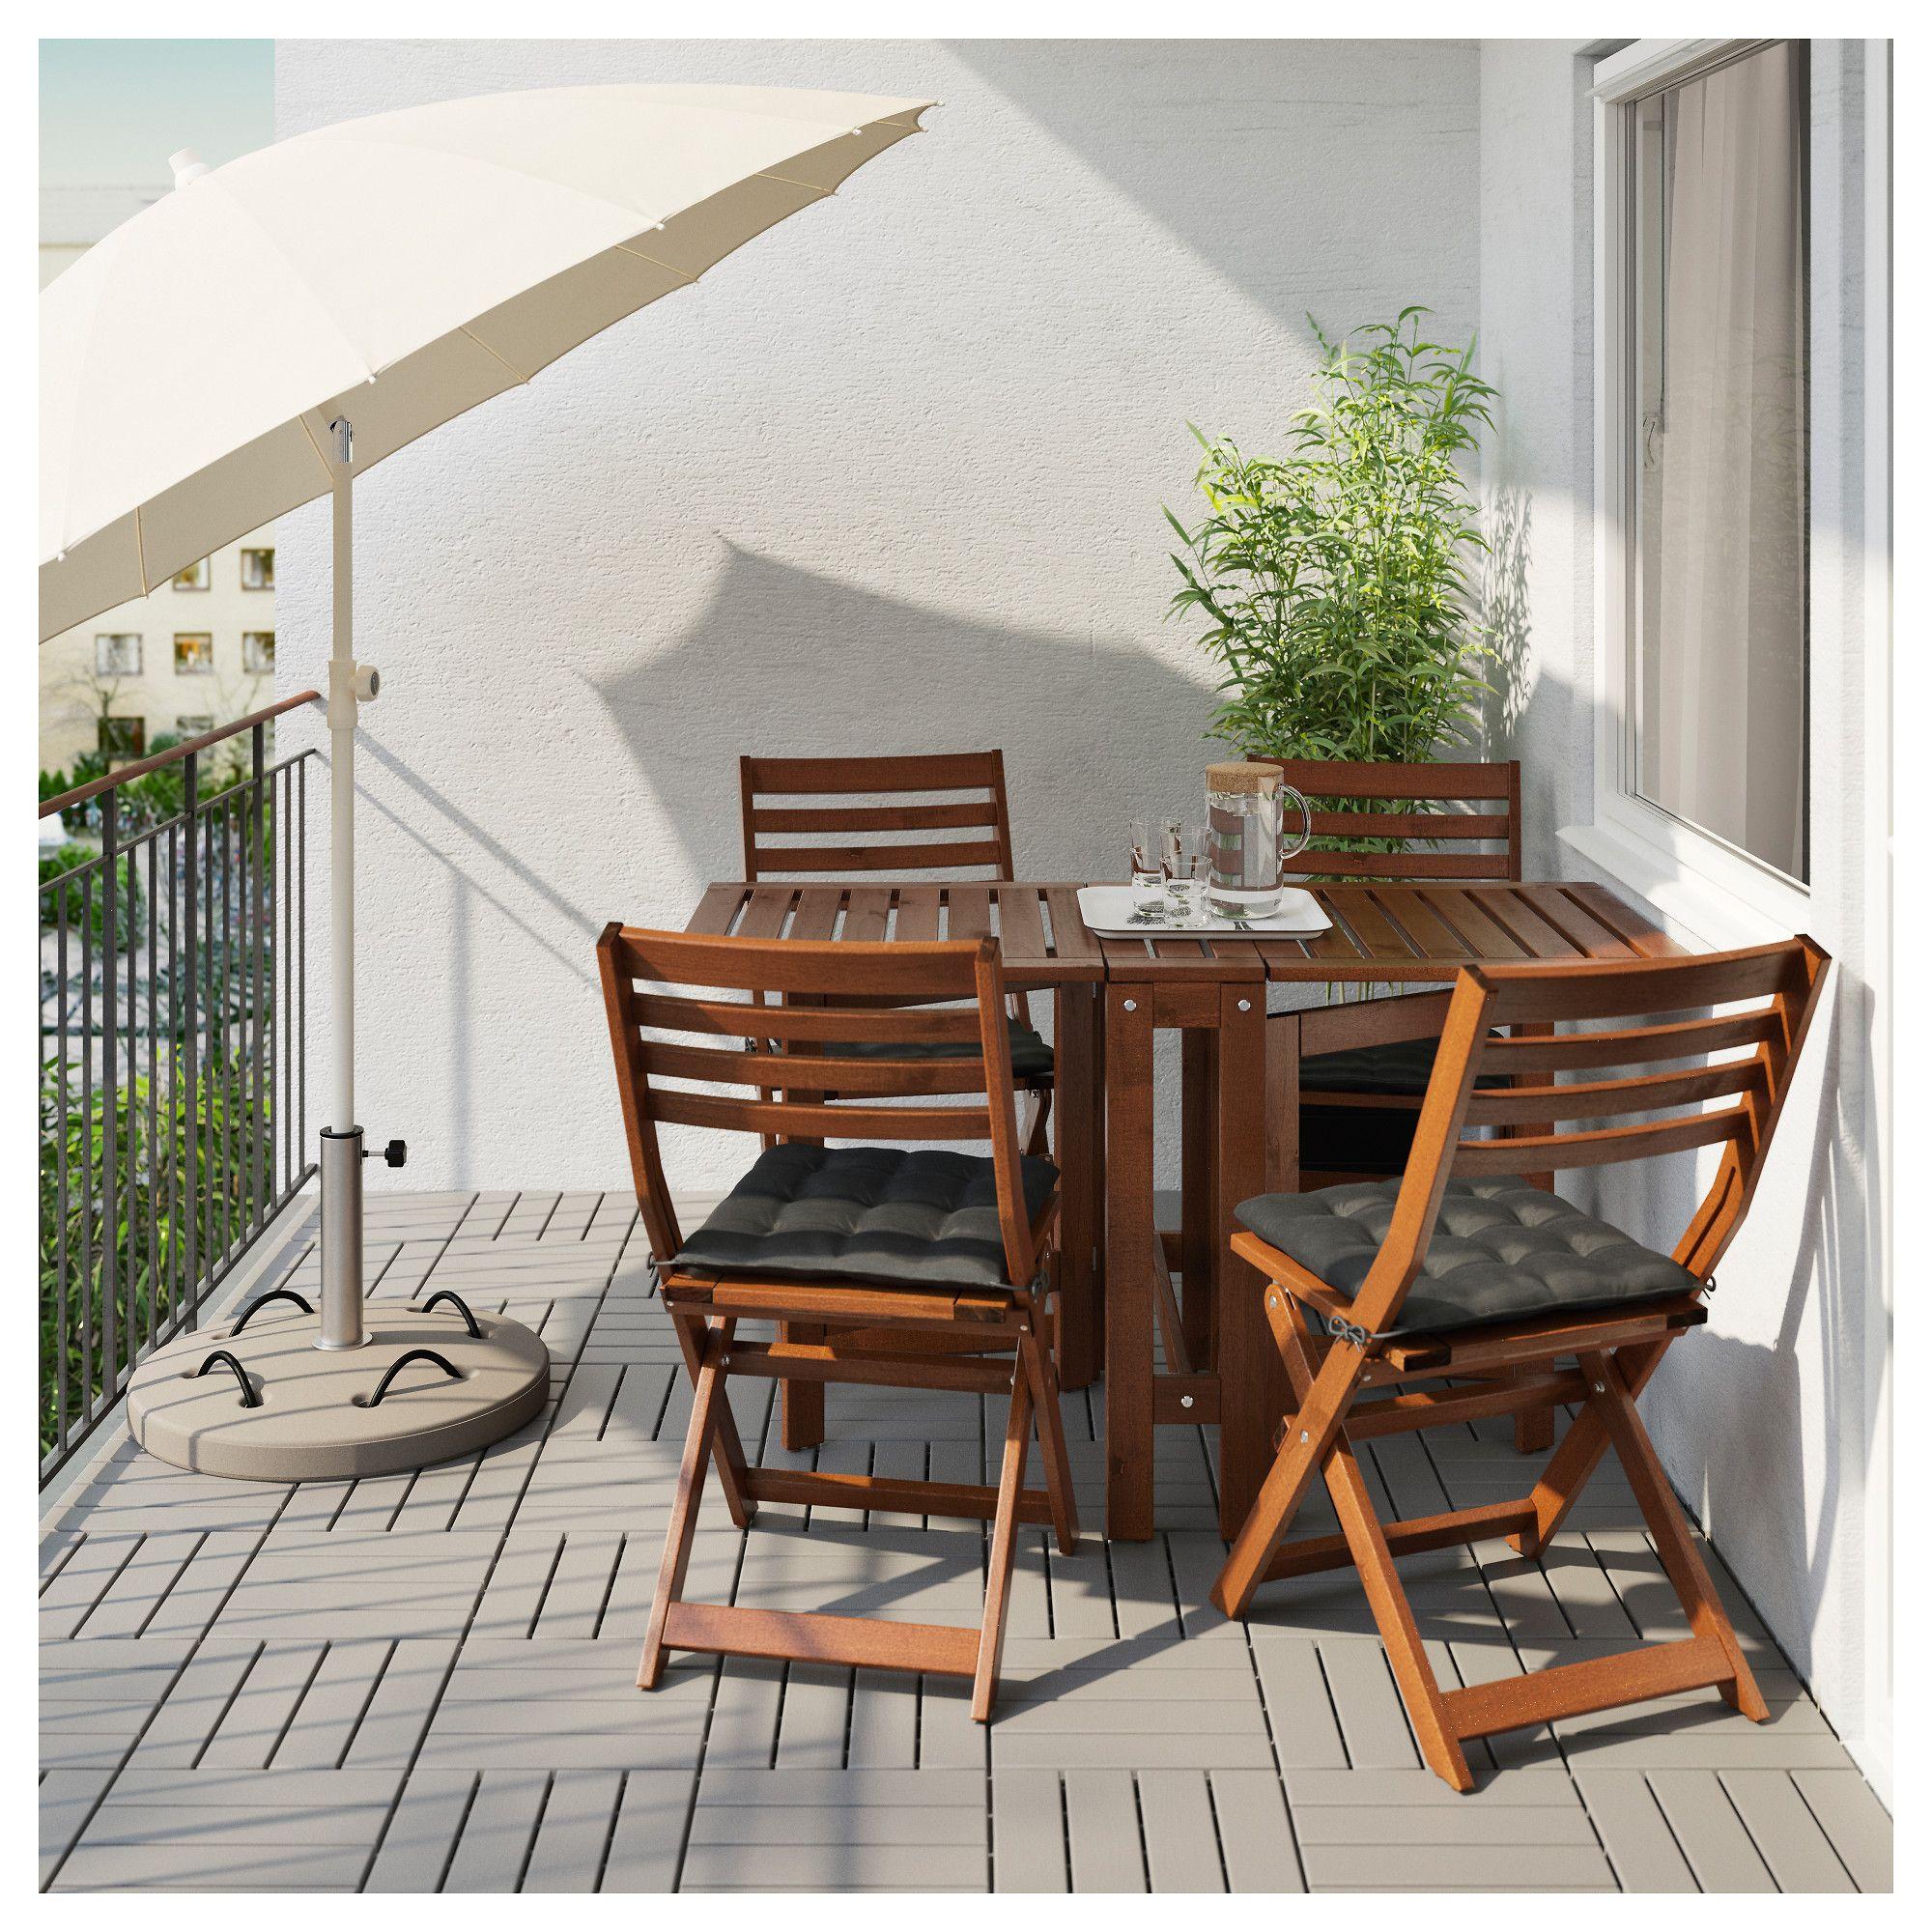 Tavolino Per Balcone Ikea furniture and home furnishings | sedie da giardino